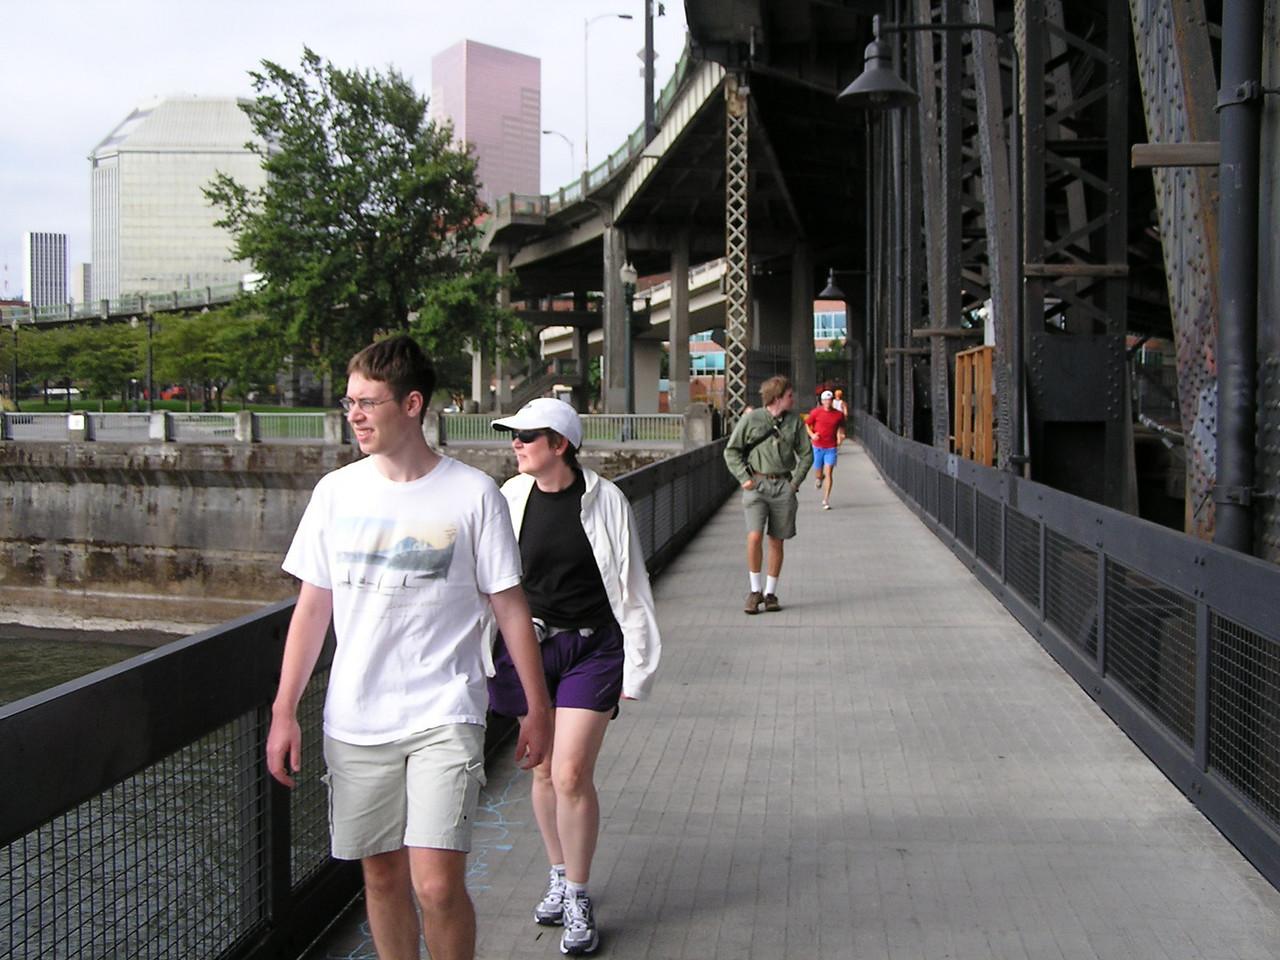 Walking on the walkway on the Steel Bridge looking west towards downtown Portland.